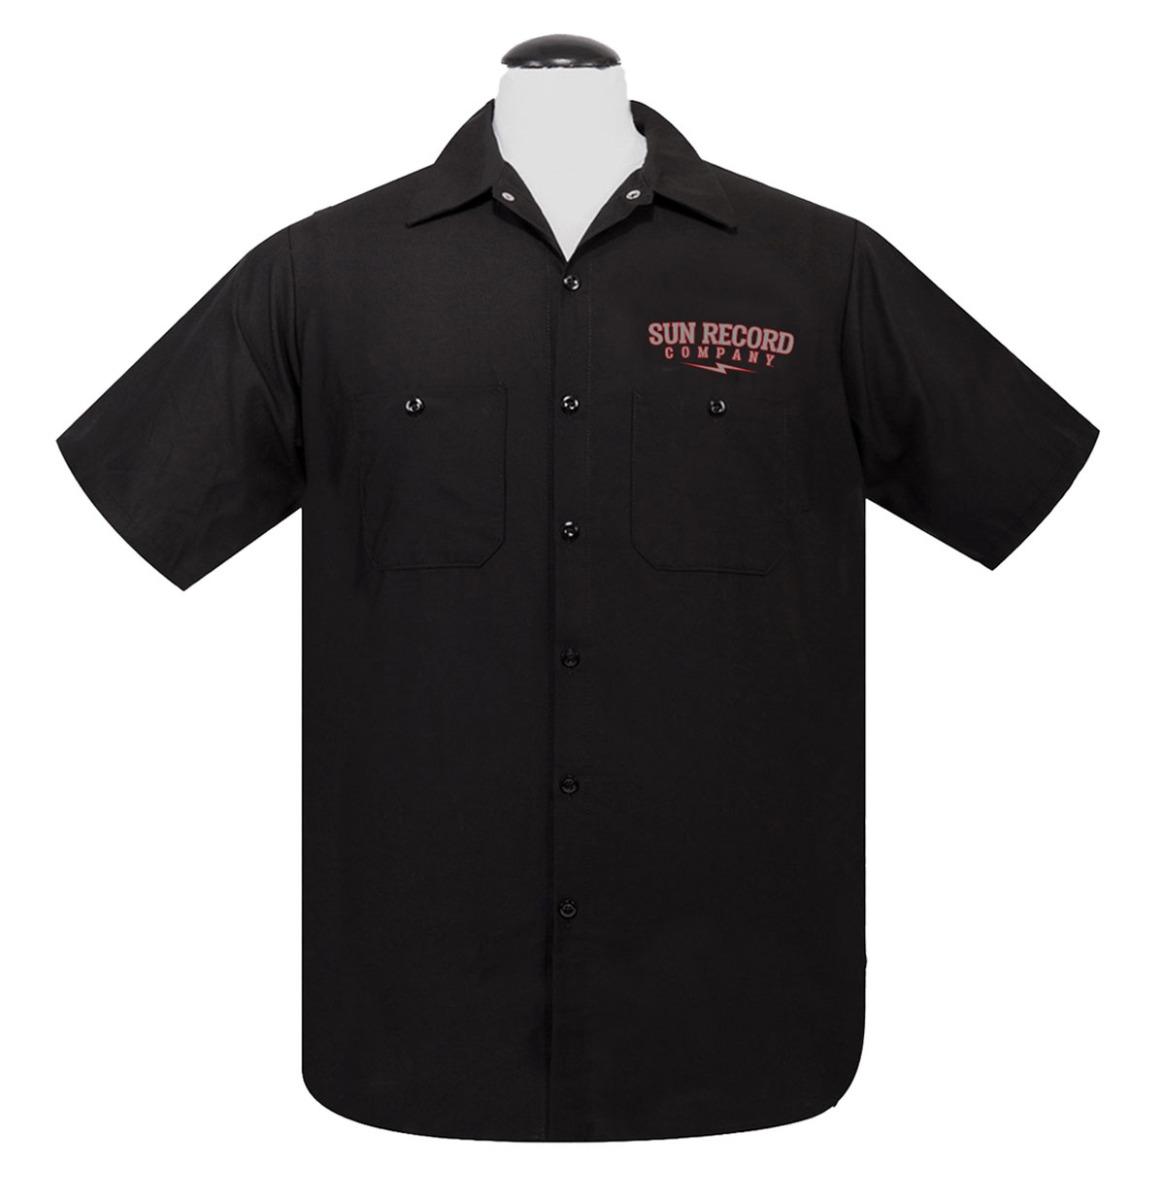 Sun Records That Rockabilly Sound Shirt, Black